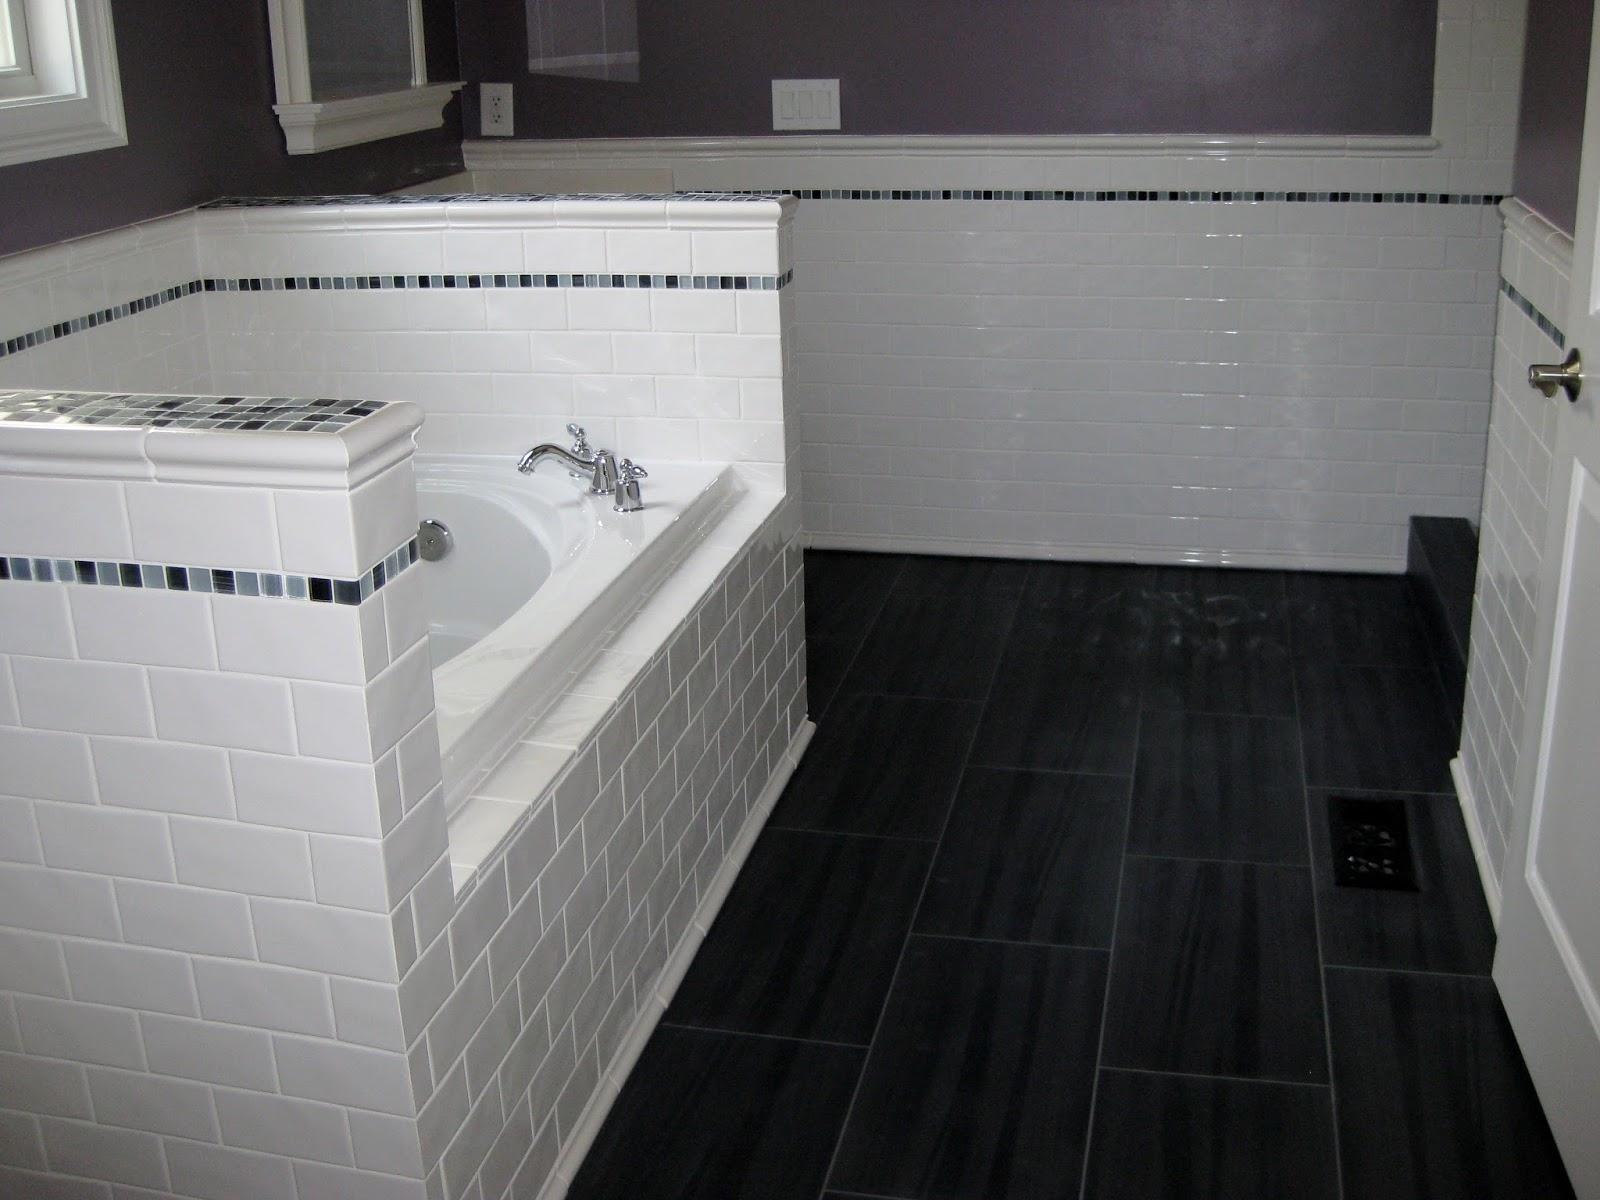 How To Create A Greyscale Bathroom: Home Decorate Ideas